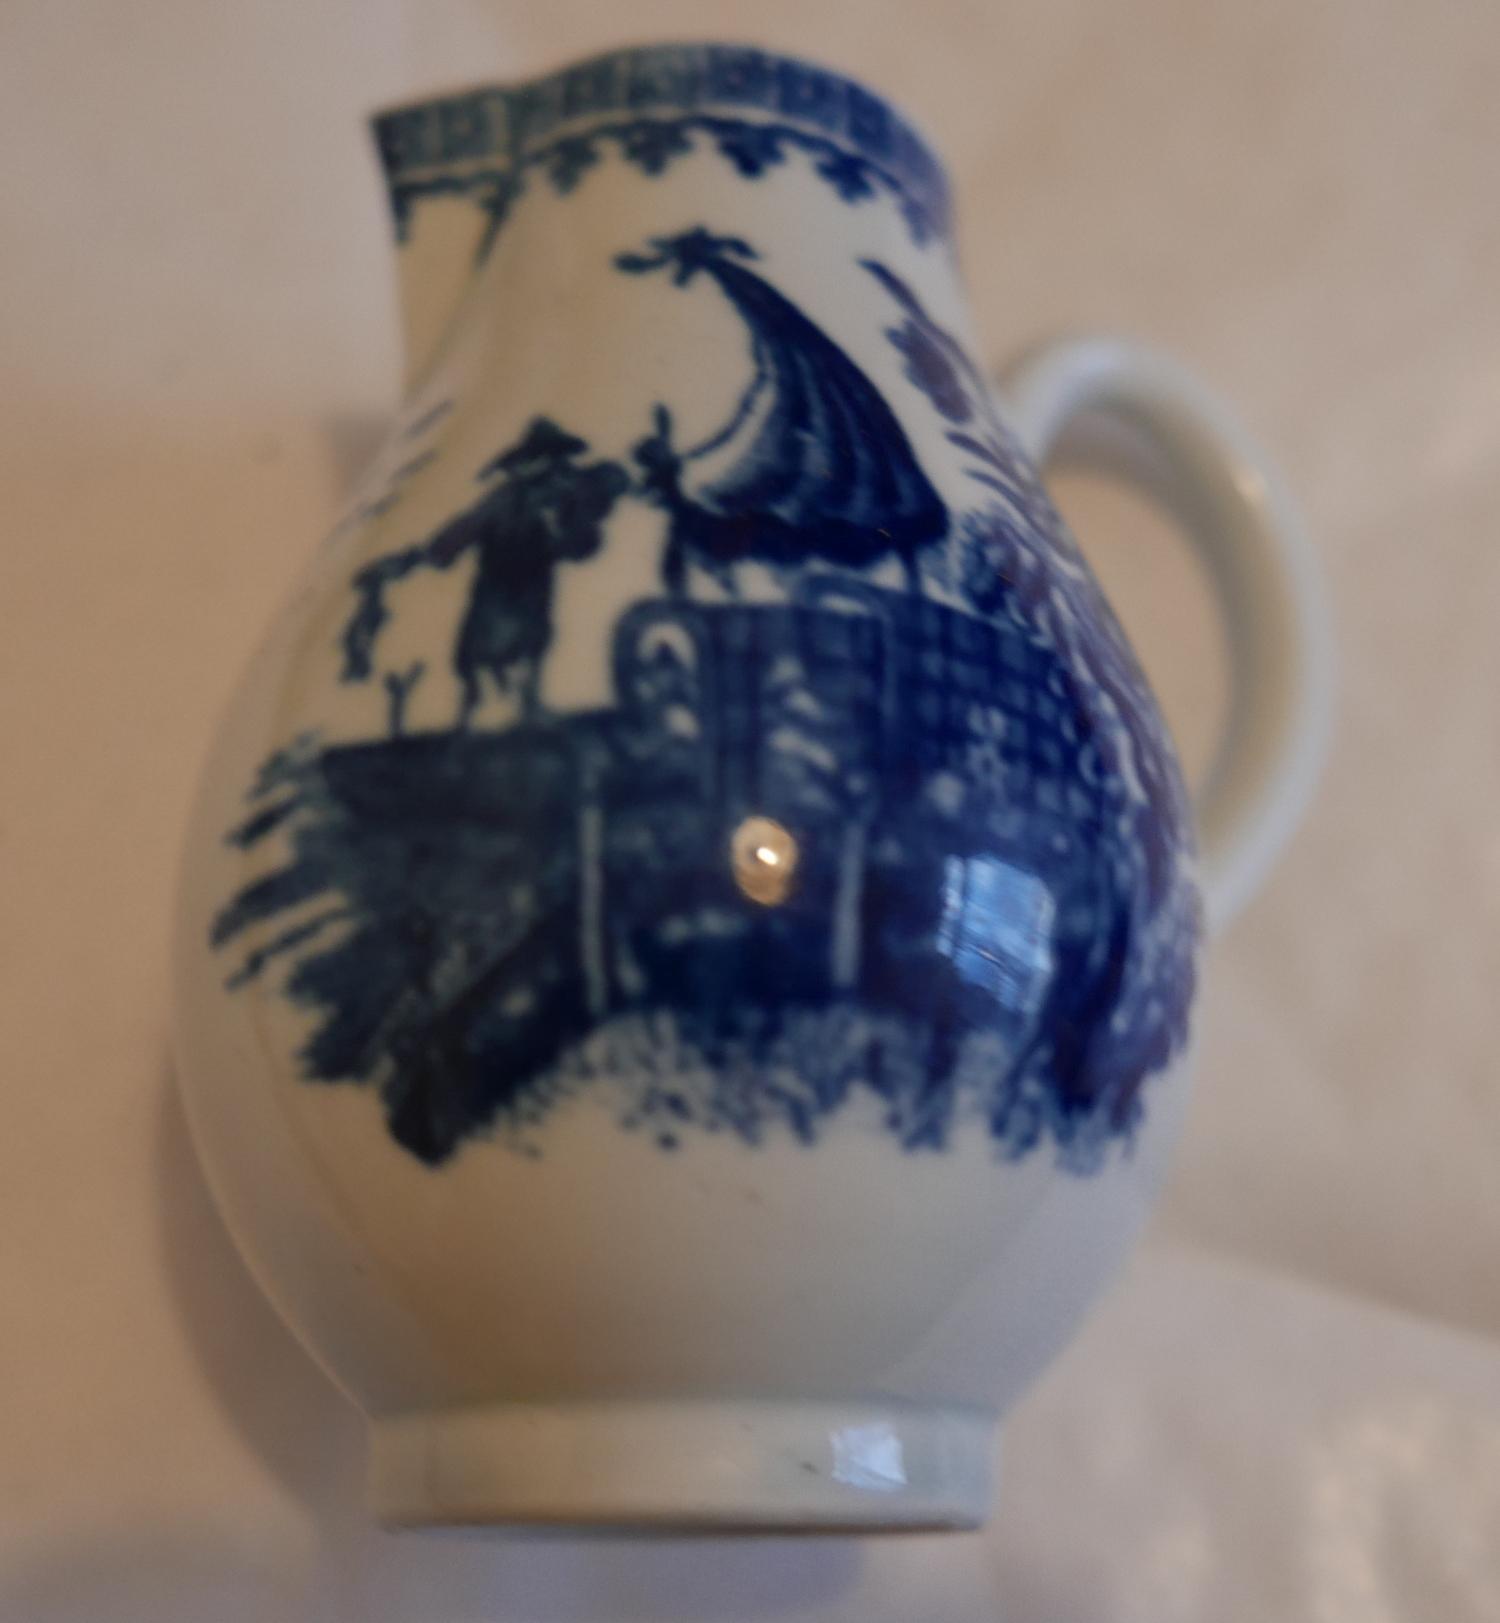 "Lot 53 - Antique 18th Century English Porcelain Sparrow Beak Jug 3 1/2"" tall - excellent cond."